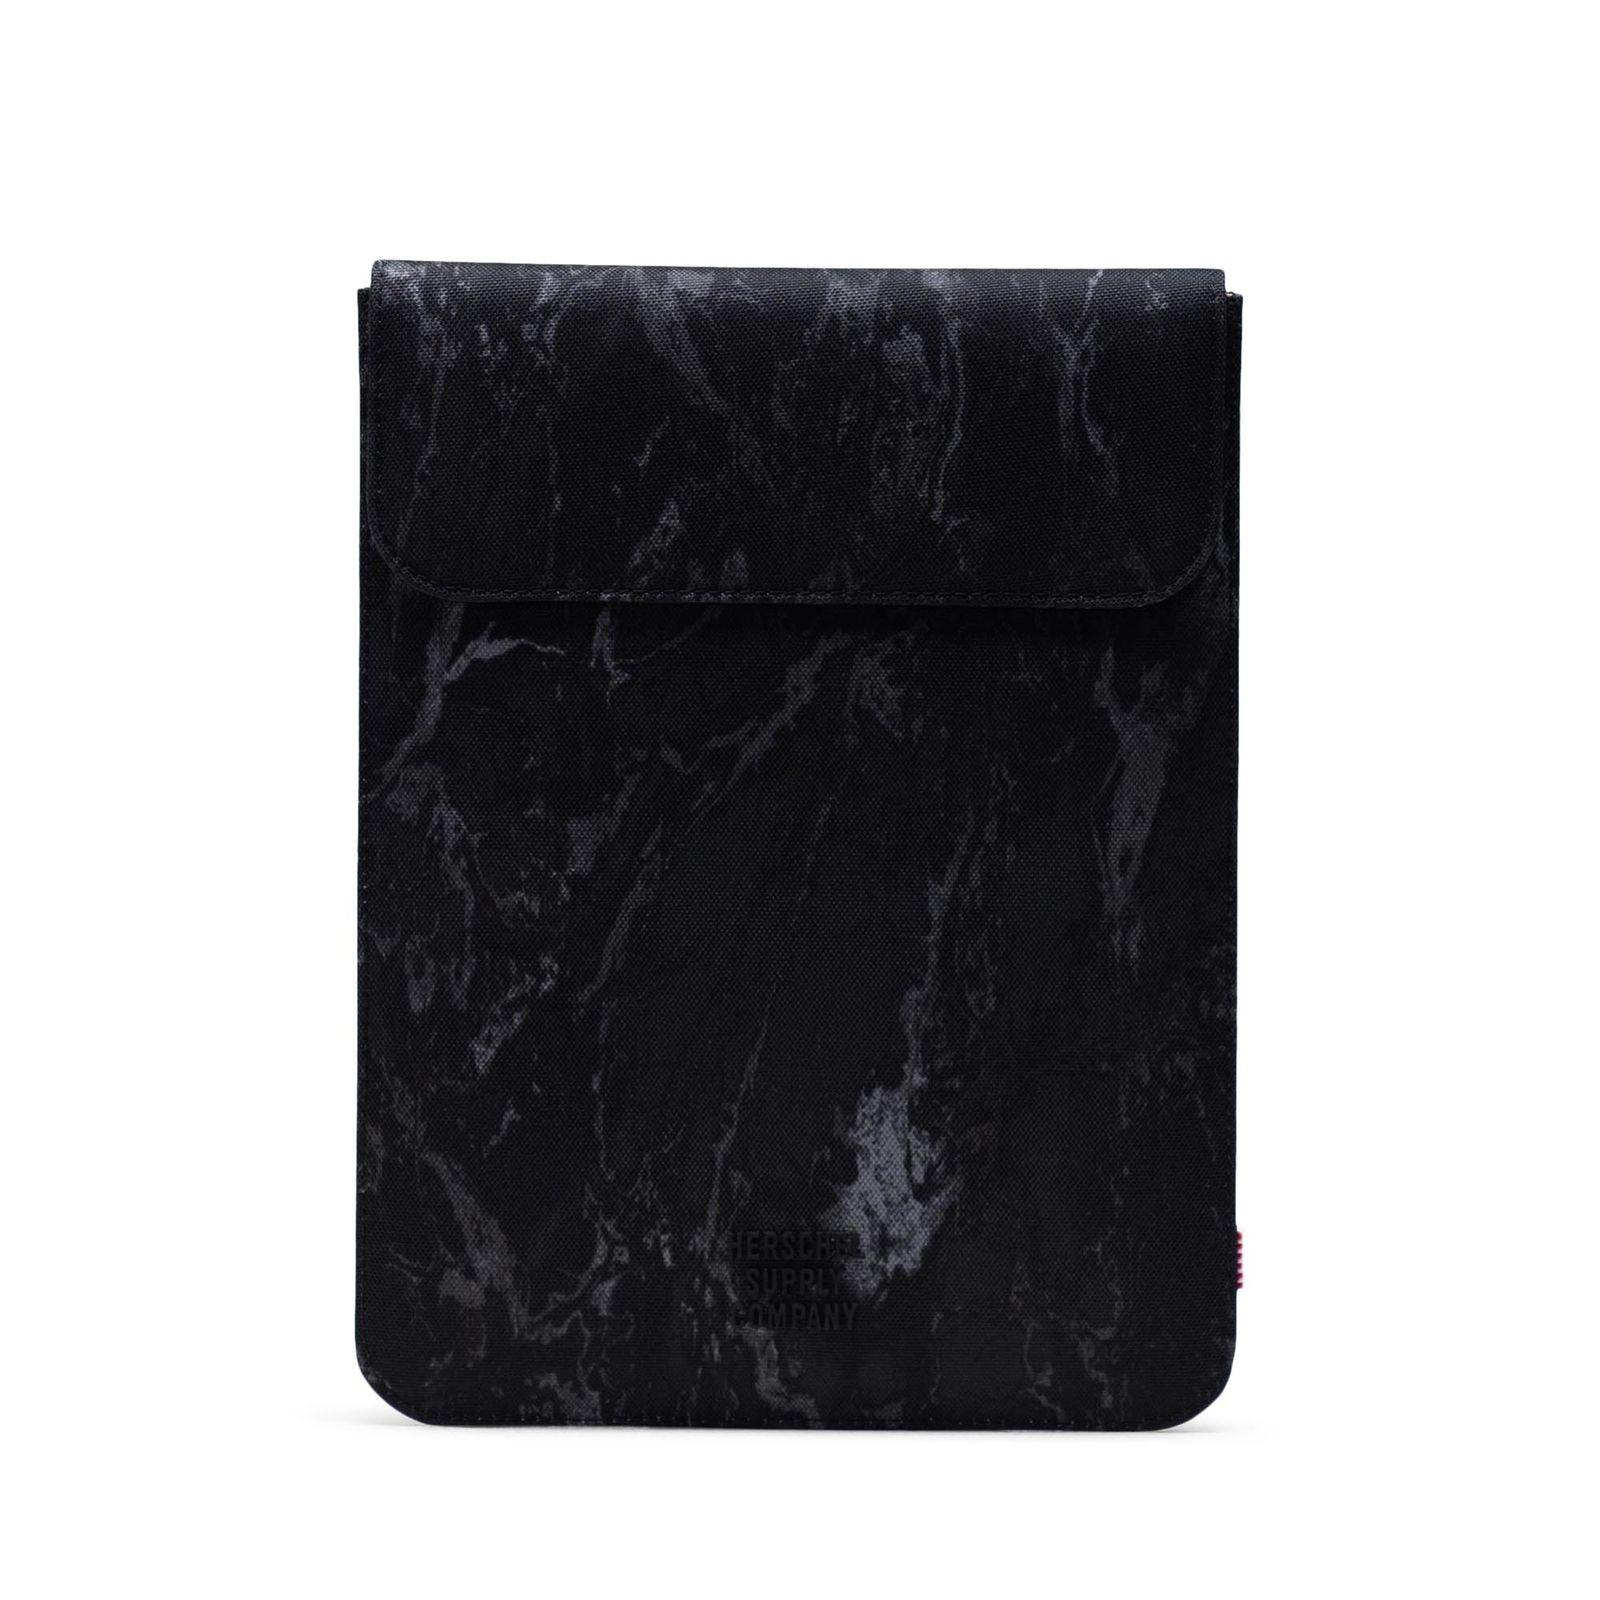 Herschel iPad Kılıfı Spokane Sleeve for iPad Air Black Marble